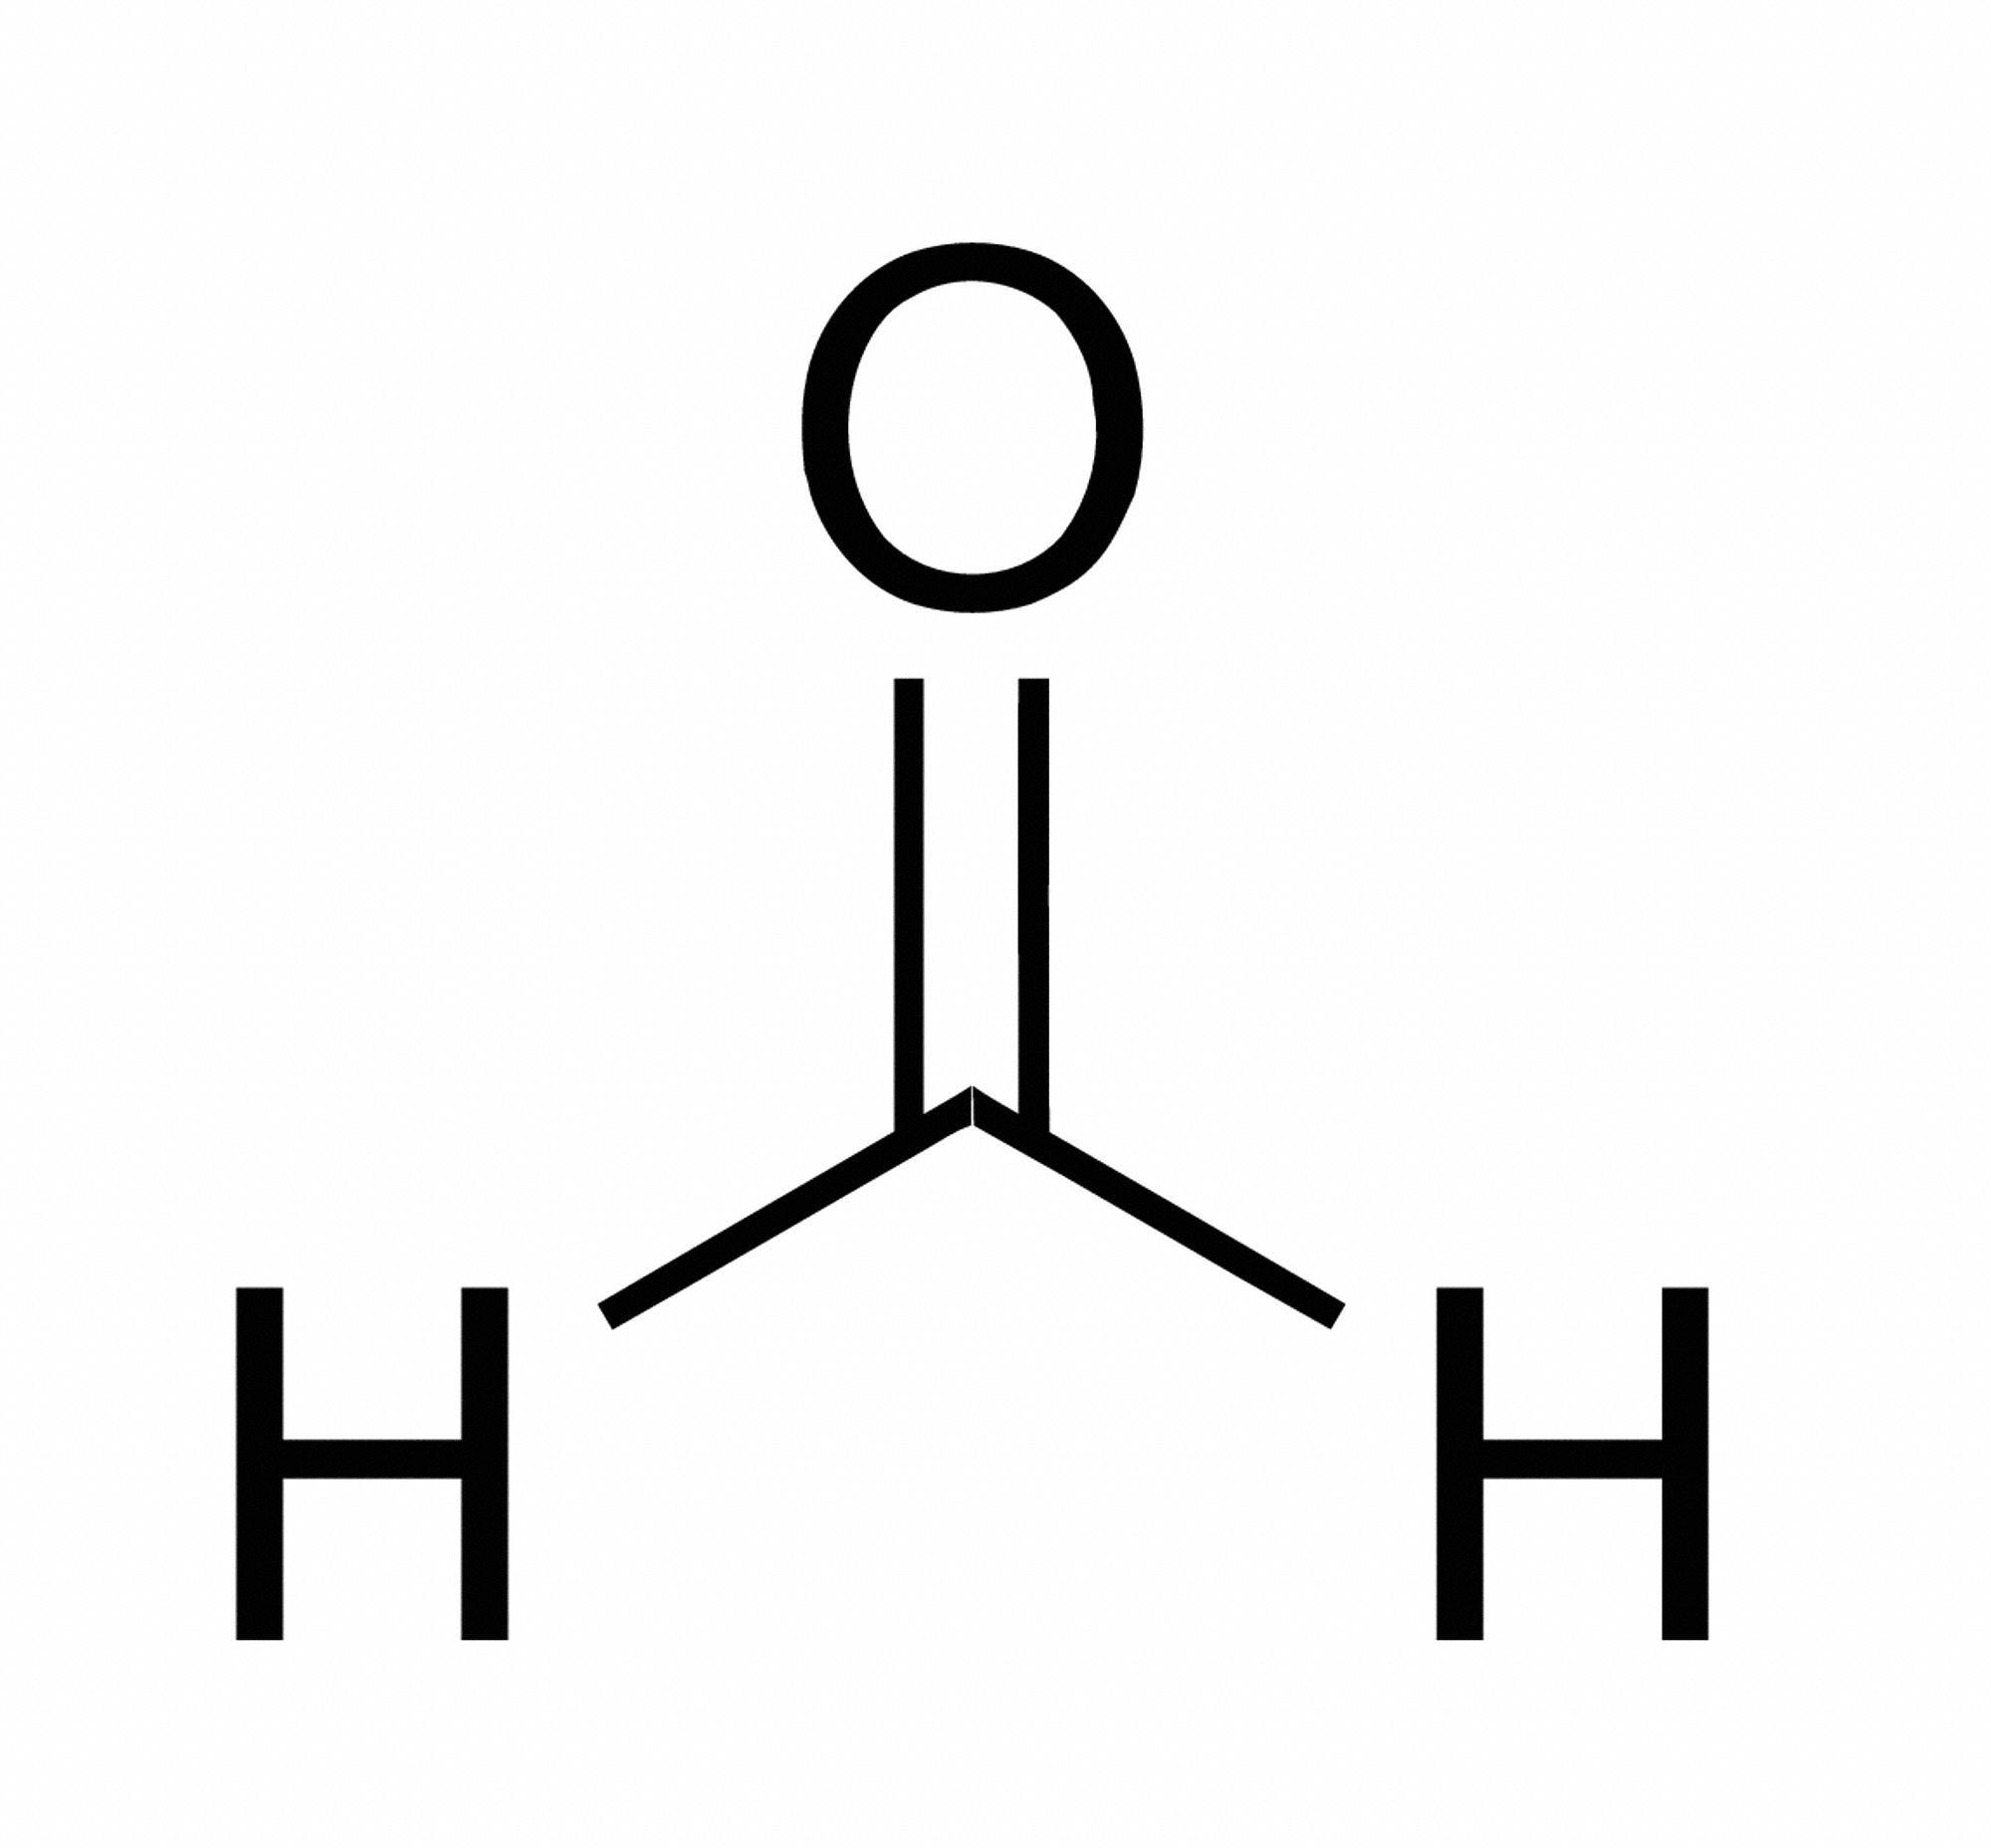 SIGMA-ALDRICH Formaldehyde Solution, 500mL, ACS Reagent